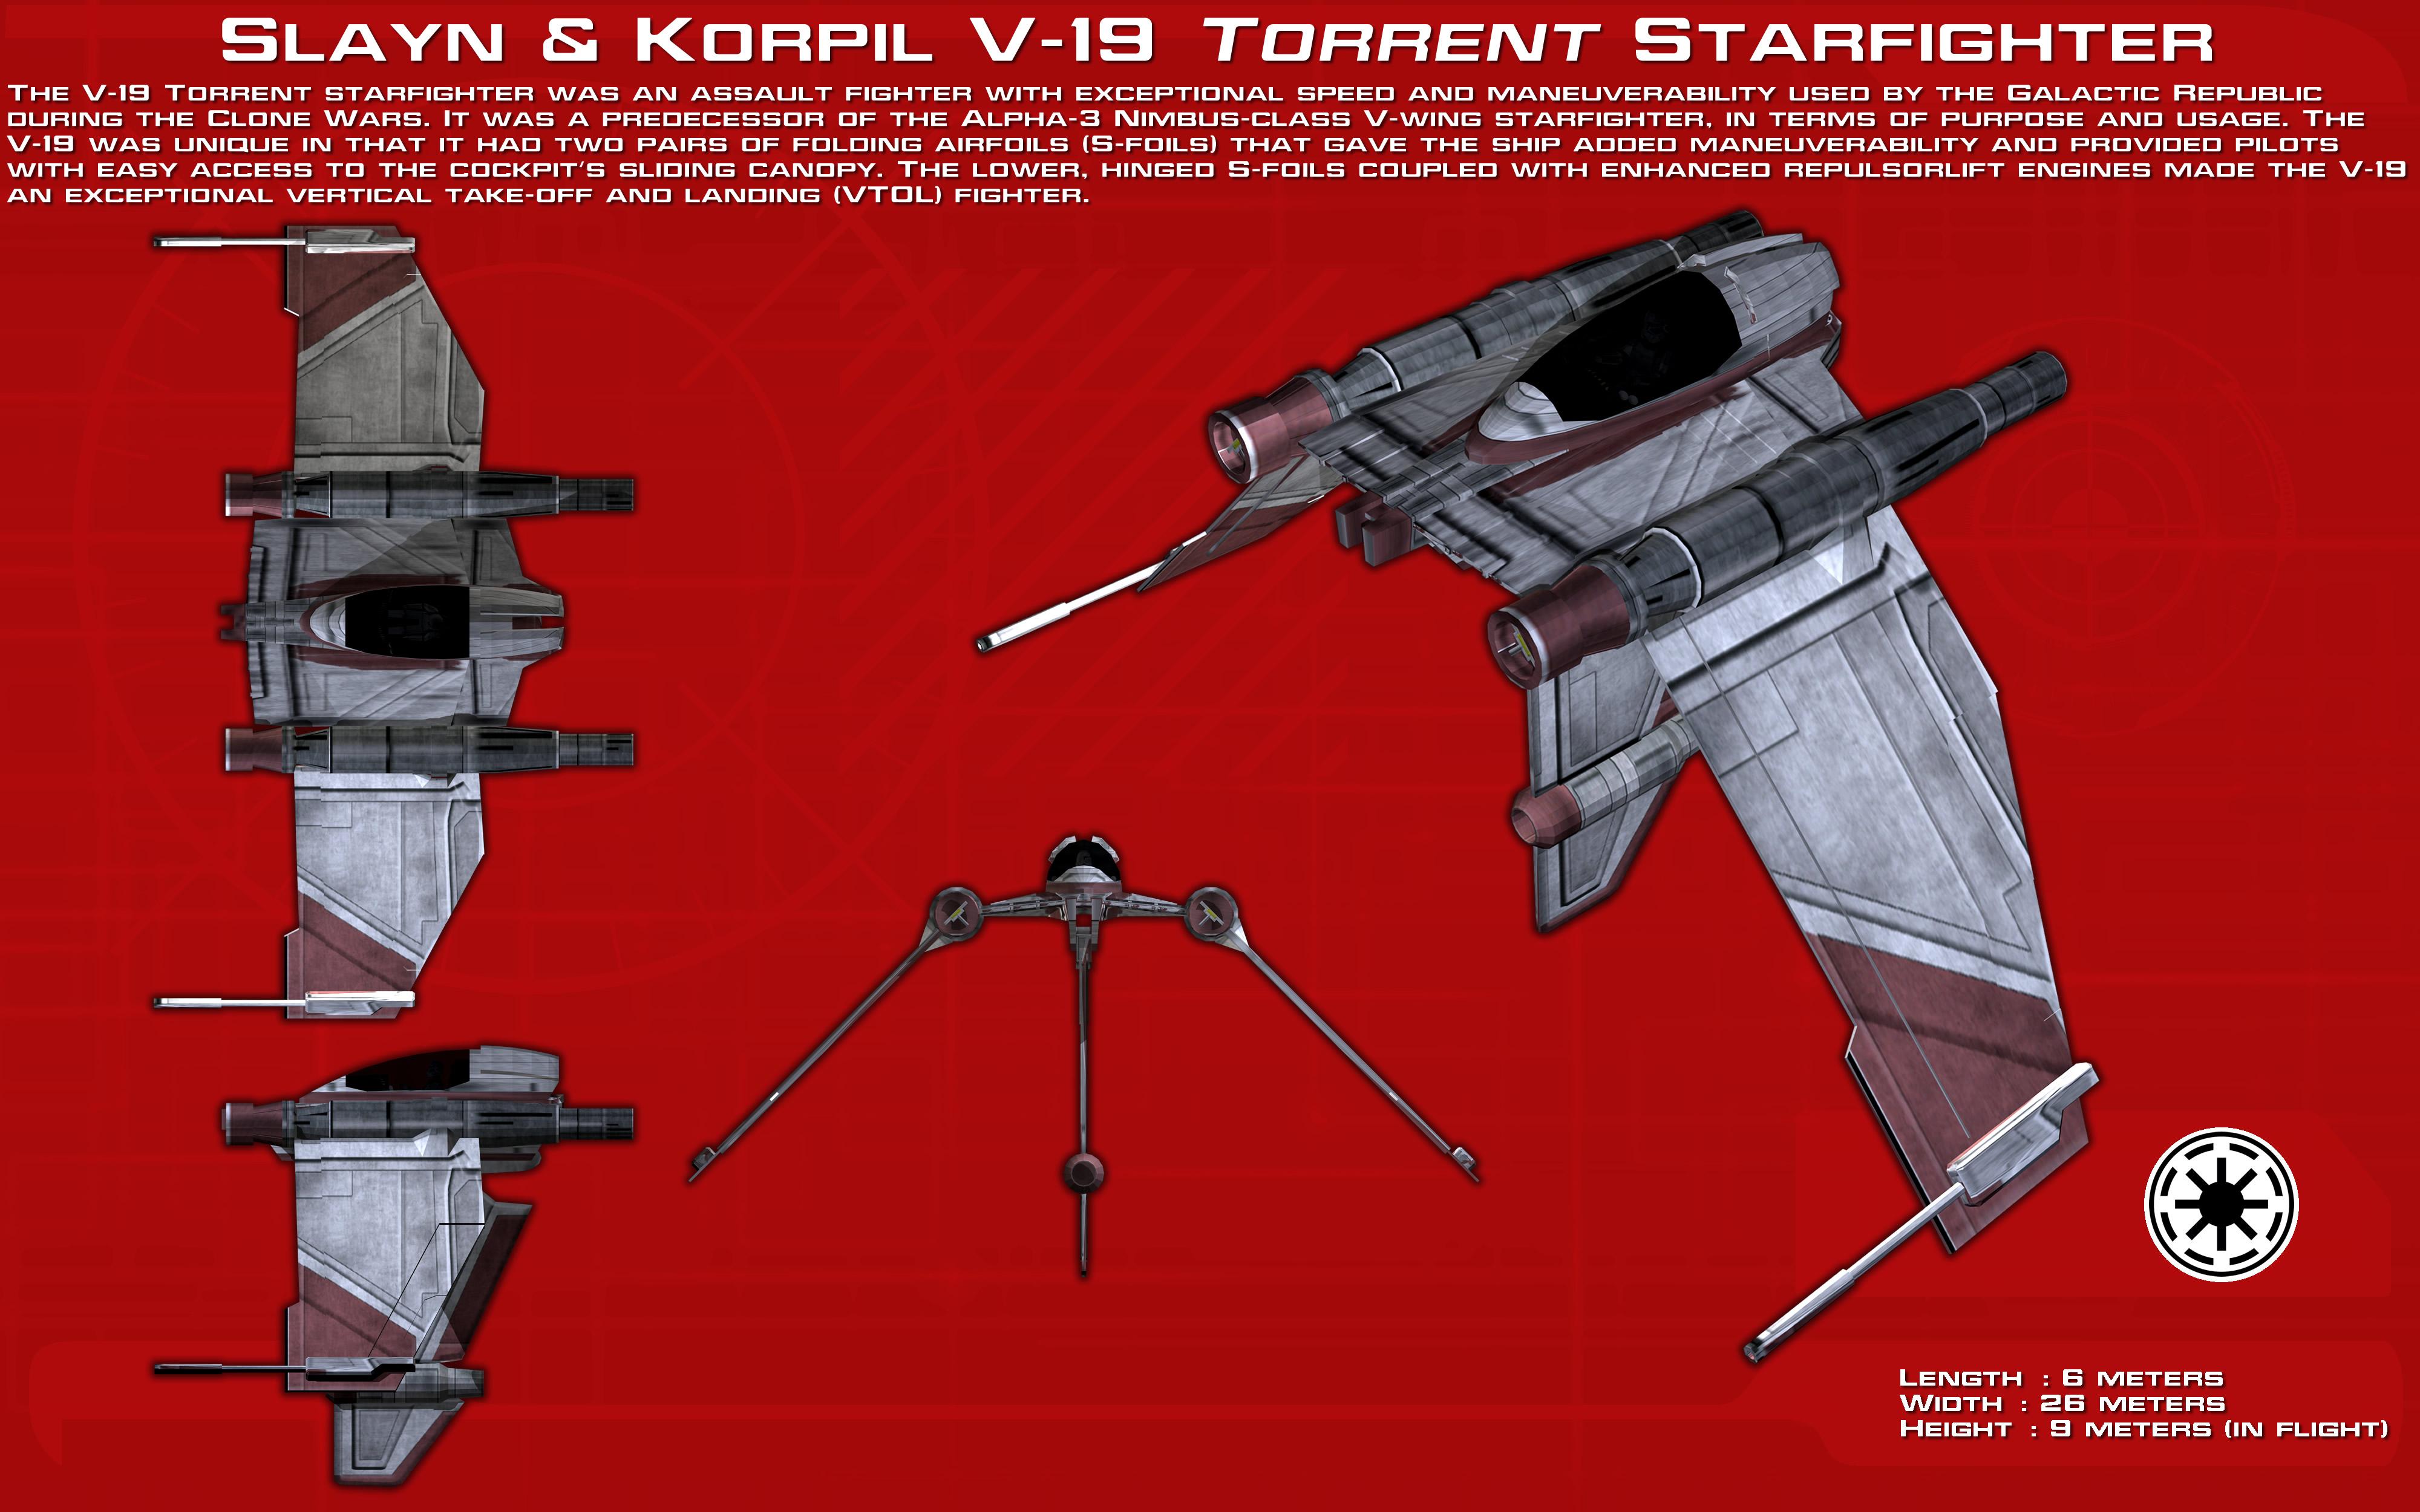 torrent star wars 7 hd